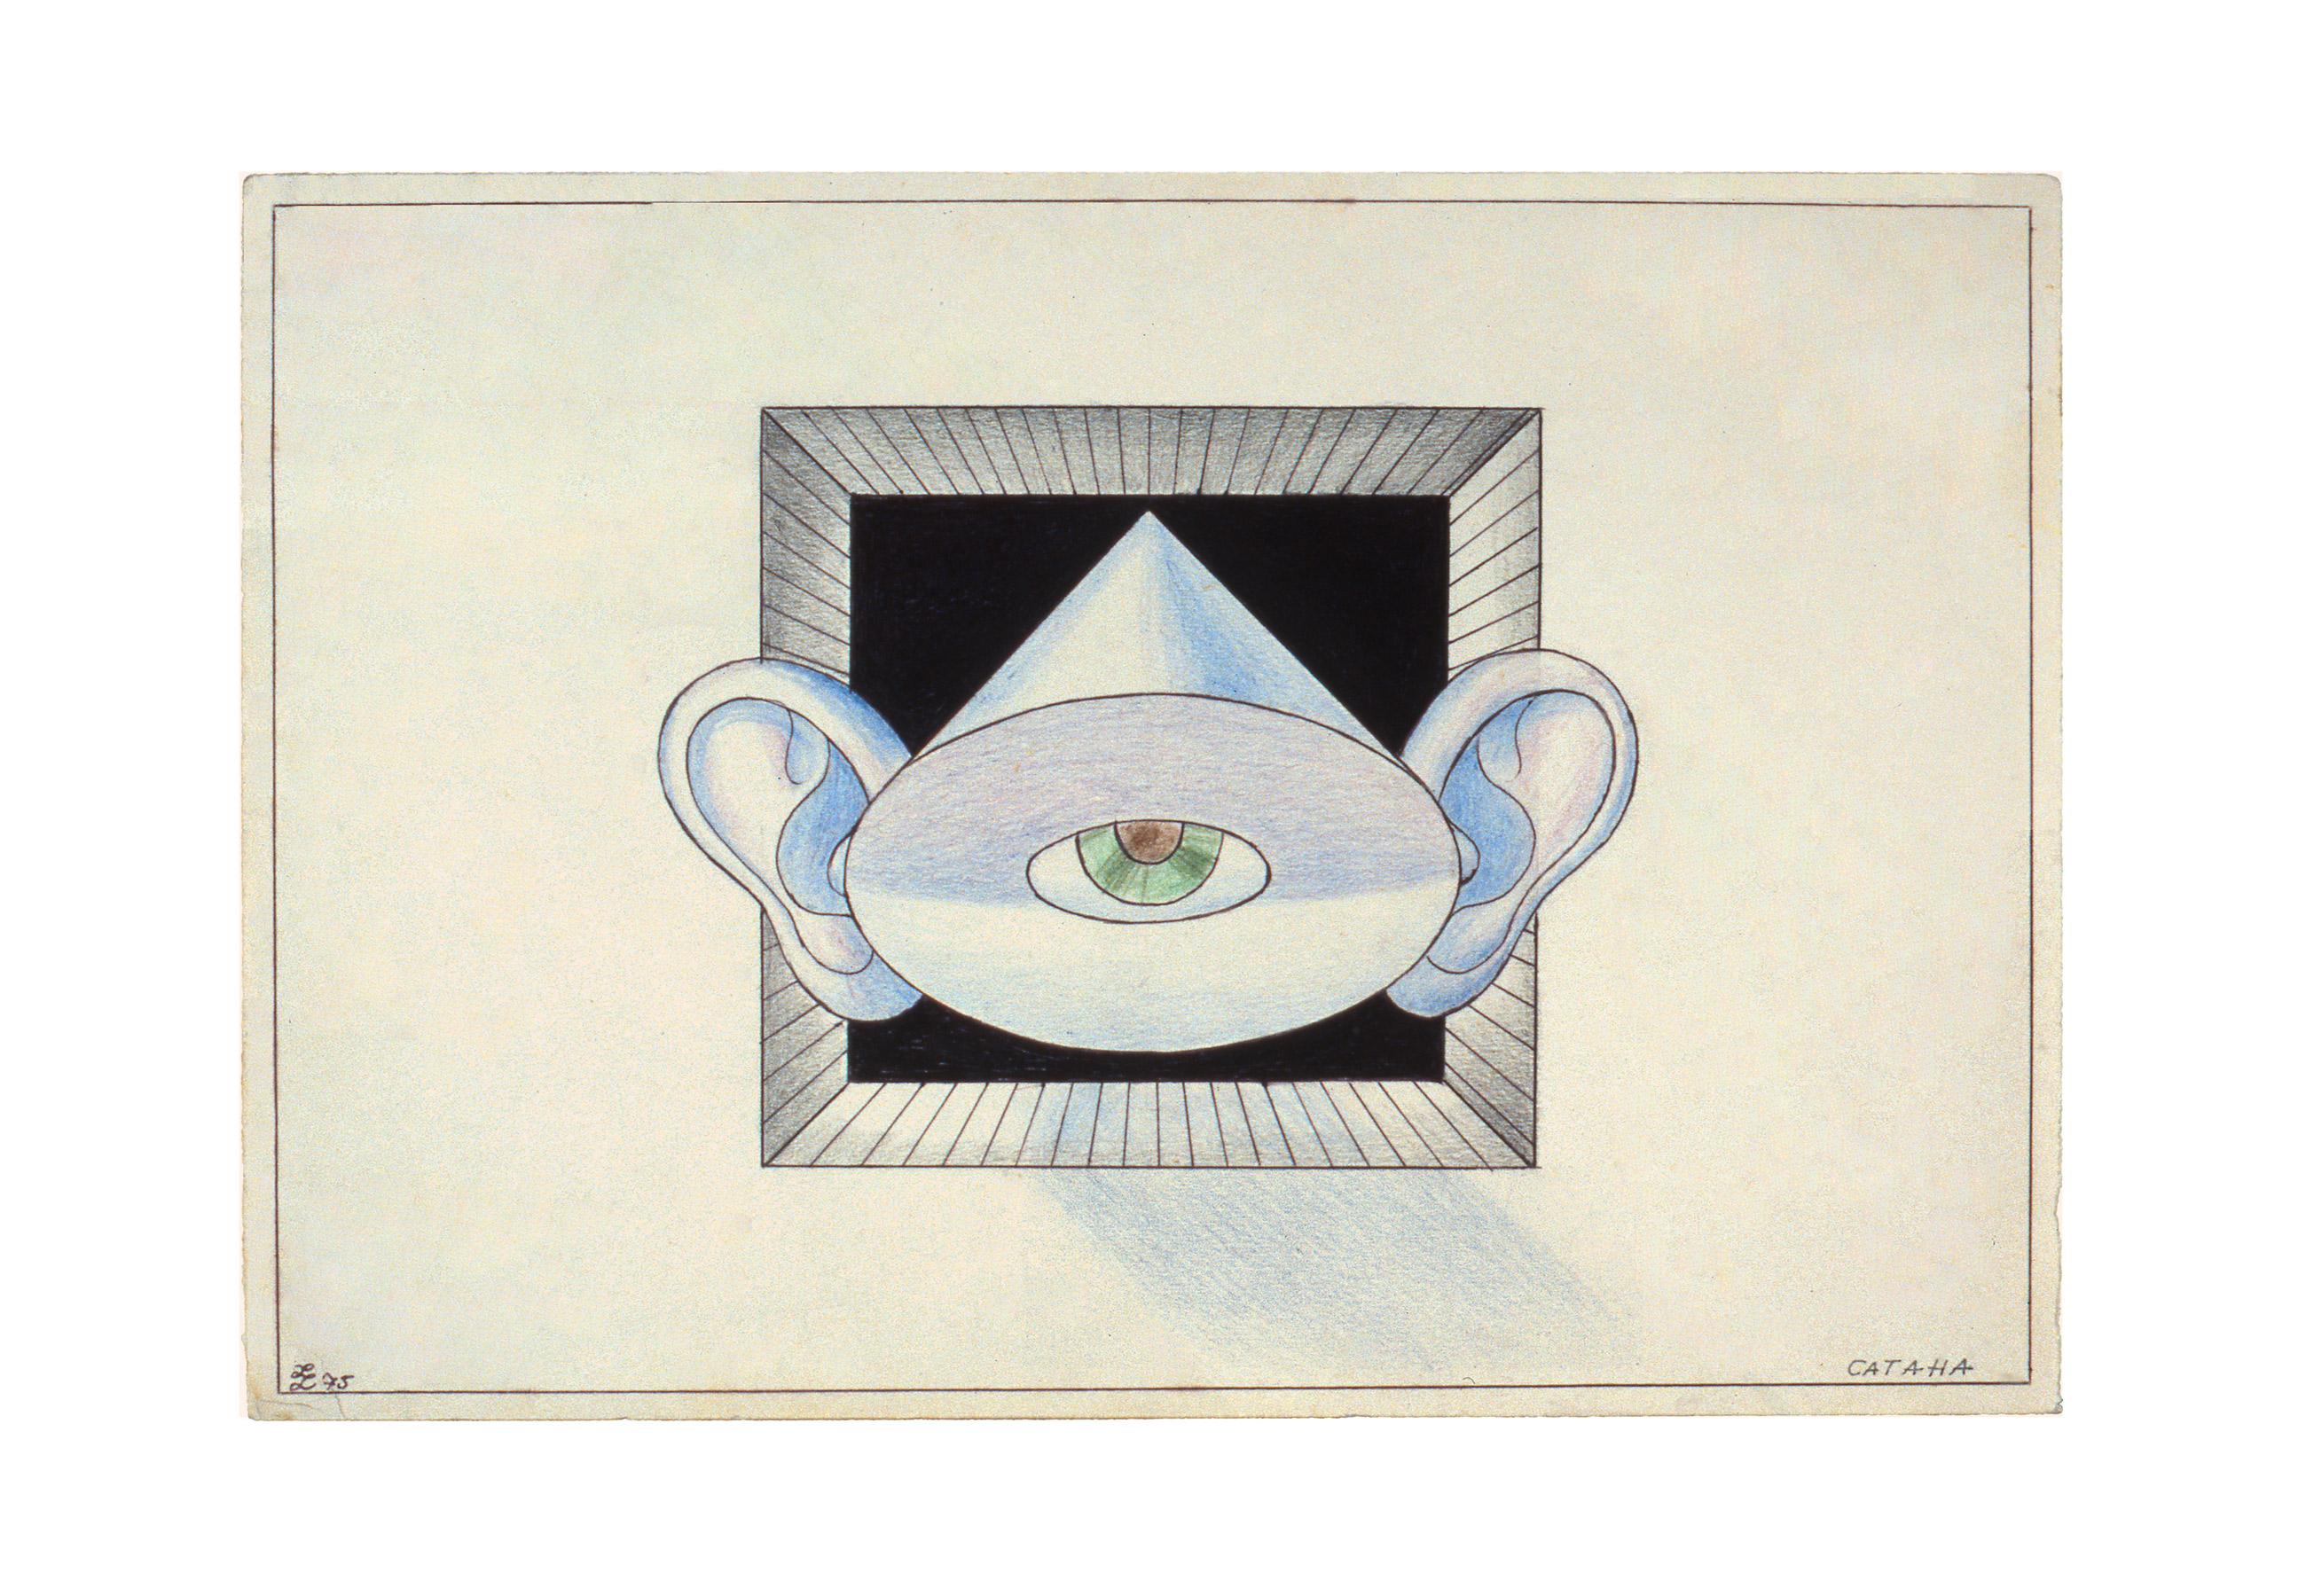 Lamm-Portfolio-1973-76-33.jpg